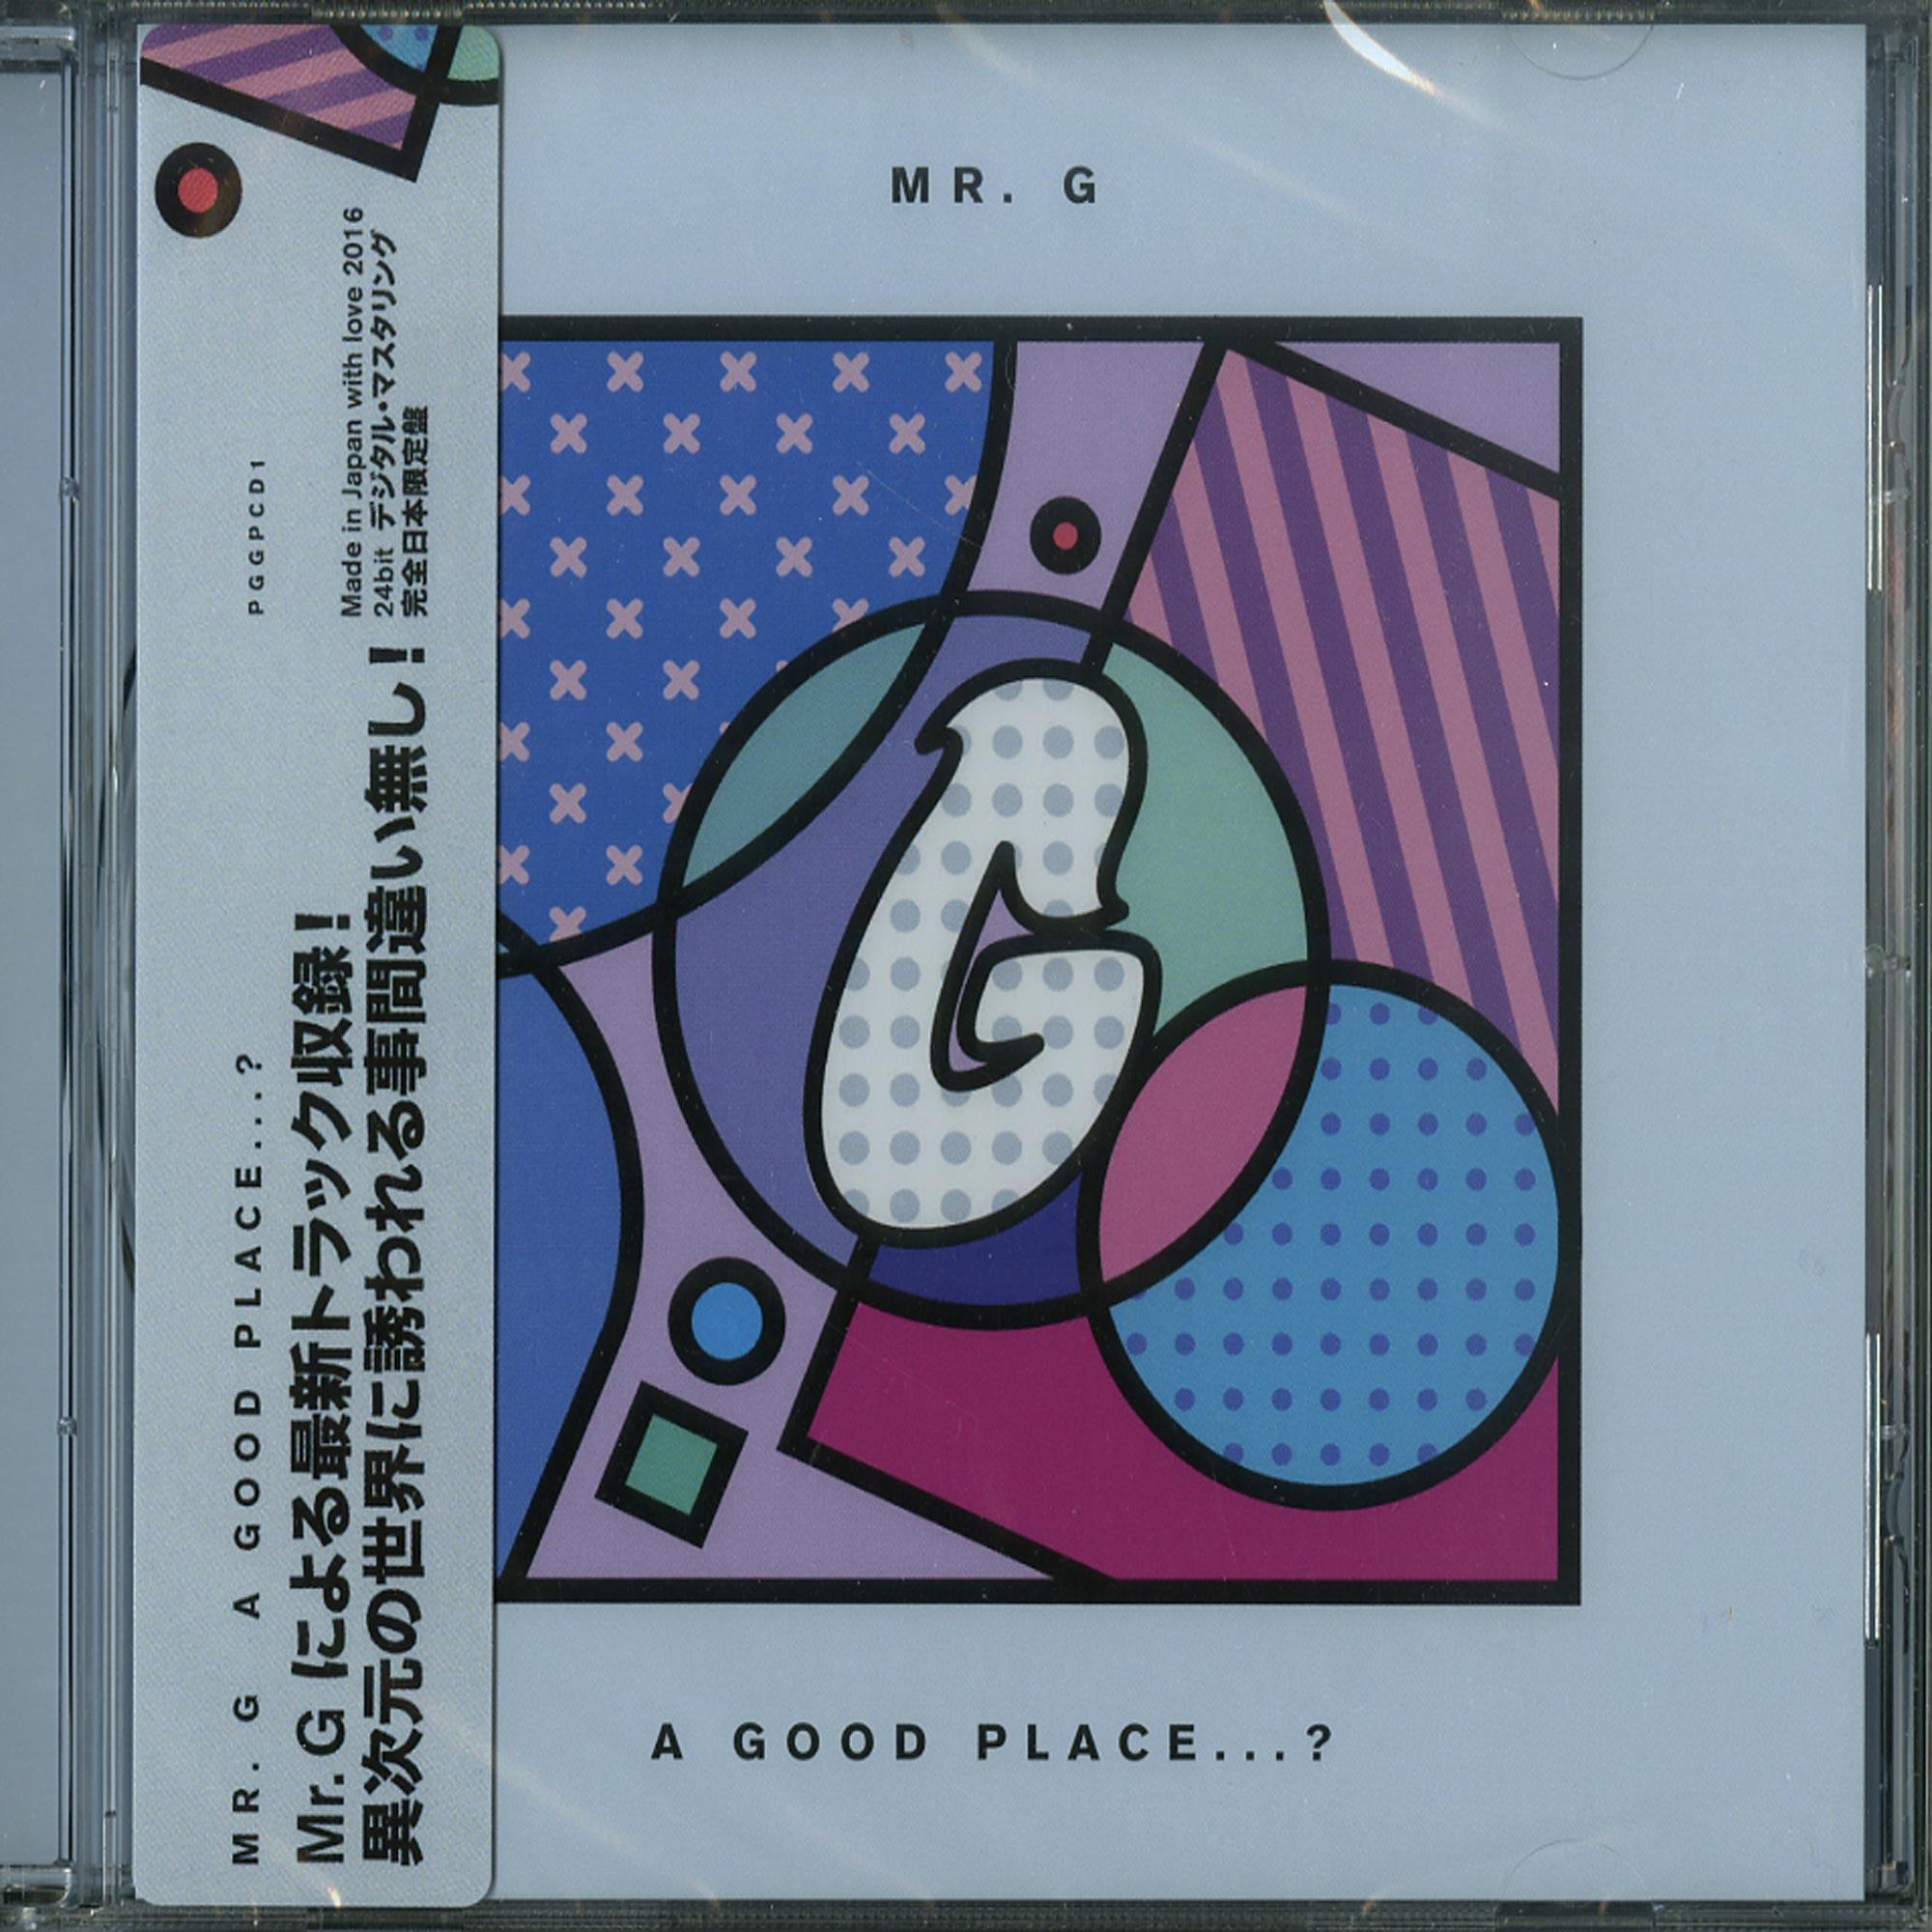 Mr. G - A GOOD PLACE...?